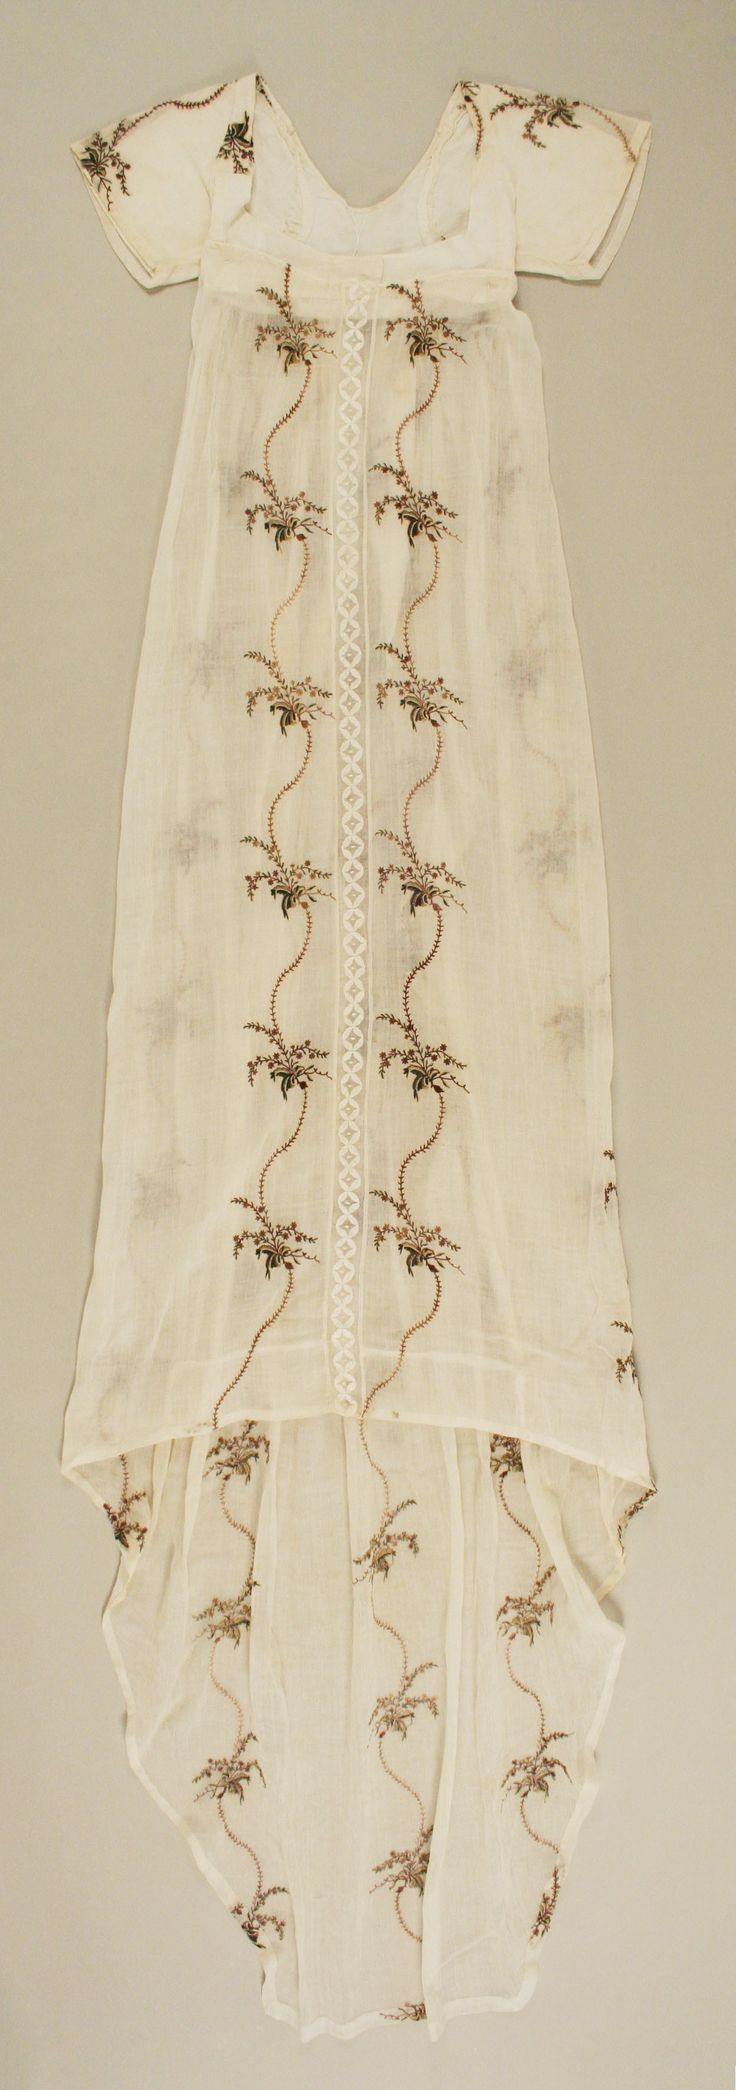 Evening dress | probably British | The Metropolitan Museum of Art